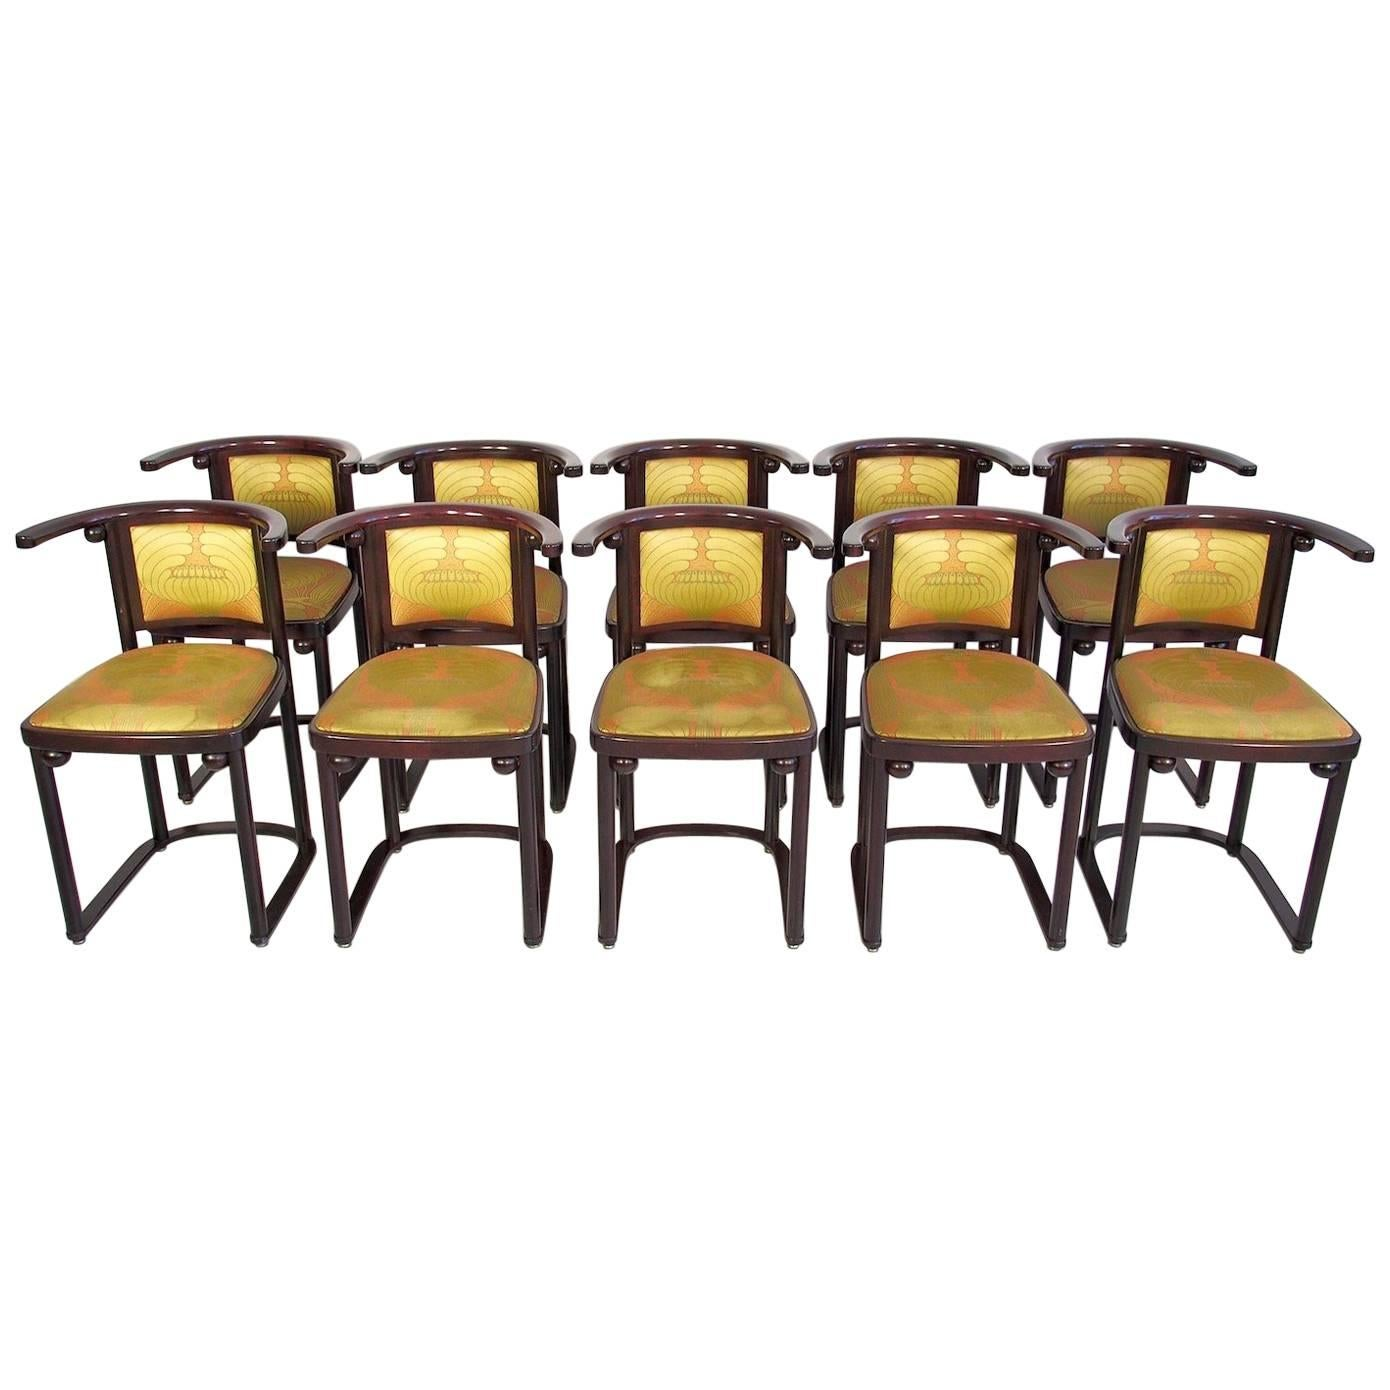 Ten Wittmann, Austria Fledermaus Dining Room Chairs Designed By Josef  Hoffman 1